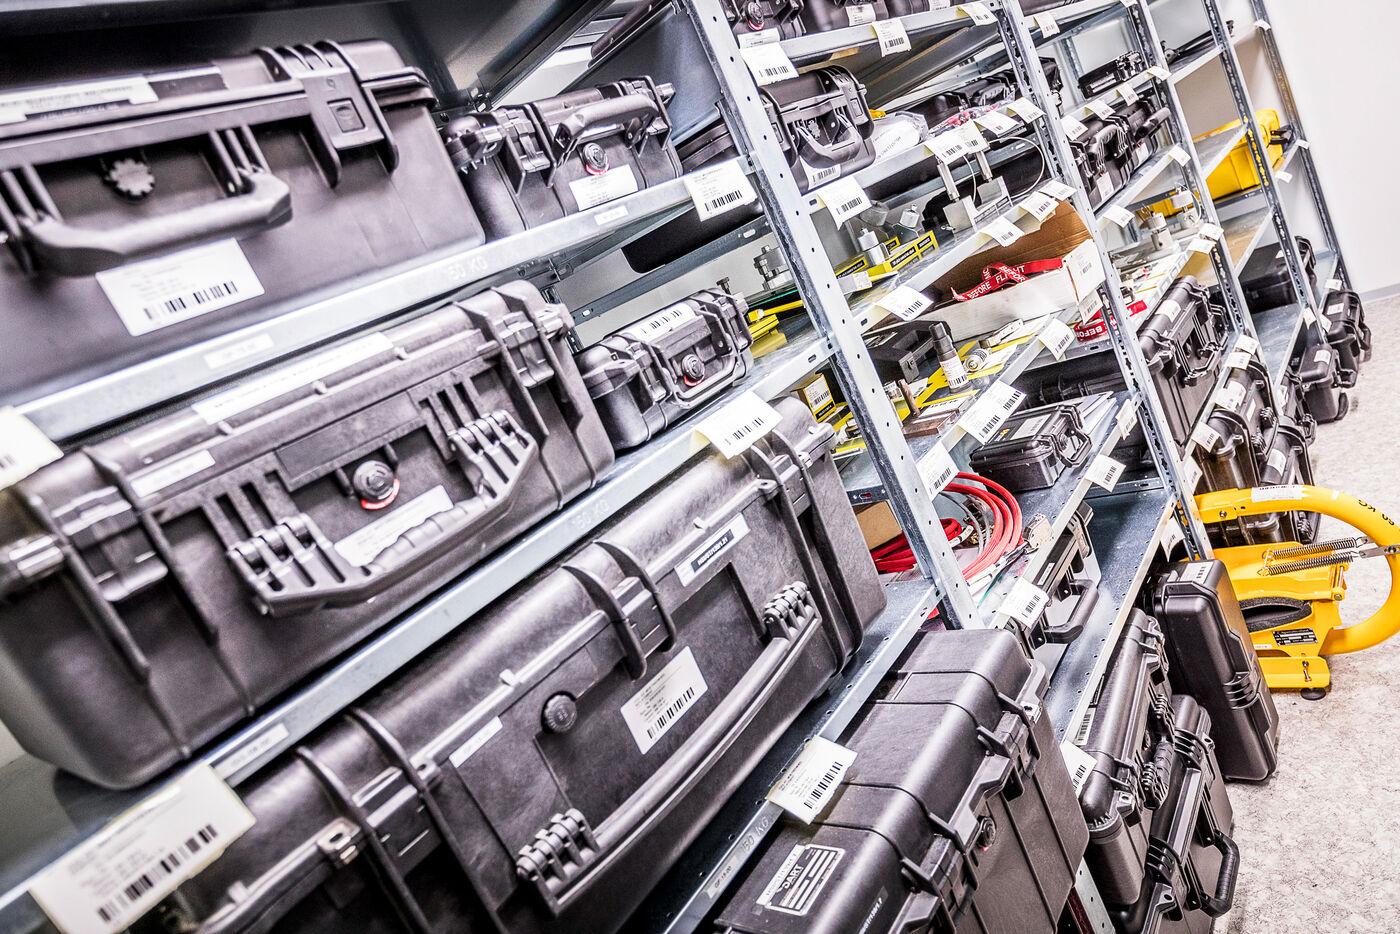 Werkzeug Manager / Toolsmanager - Job Emden - Jobs at Heli Service International GmbH